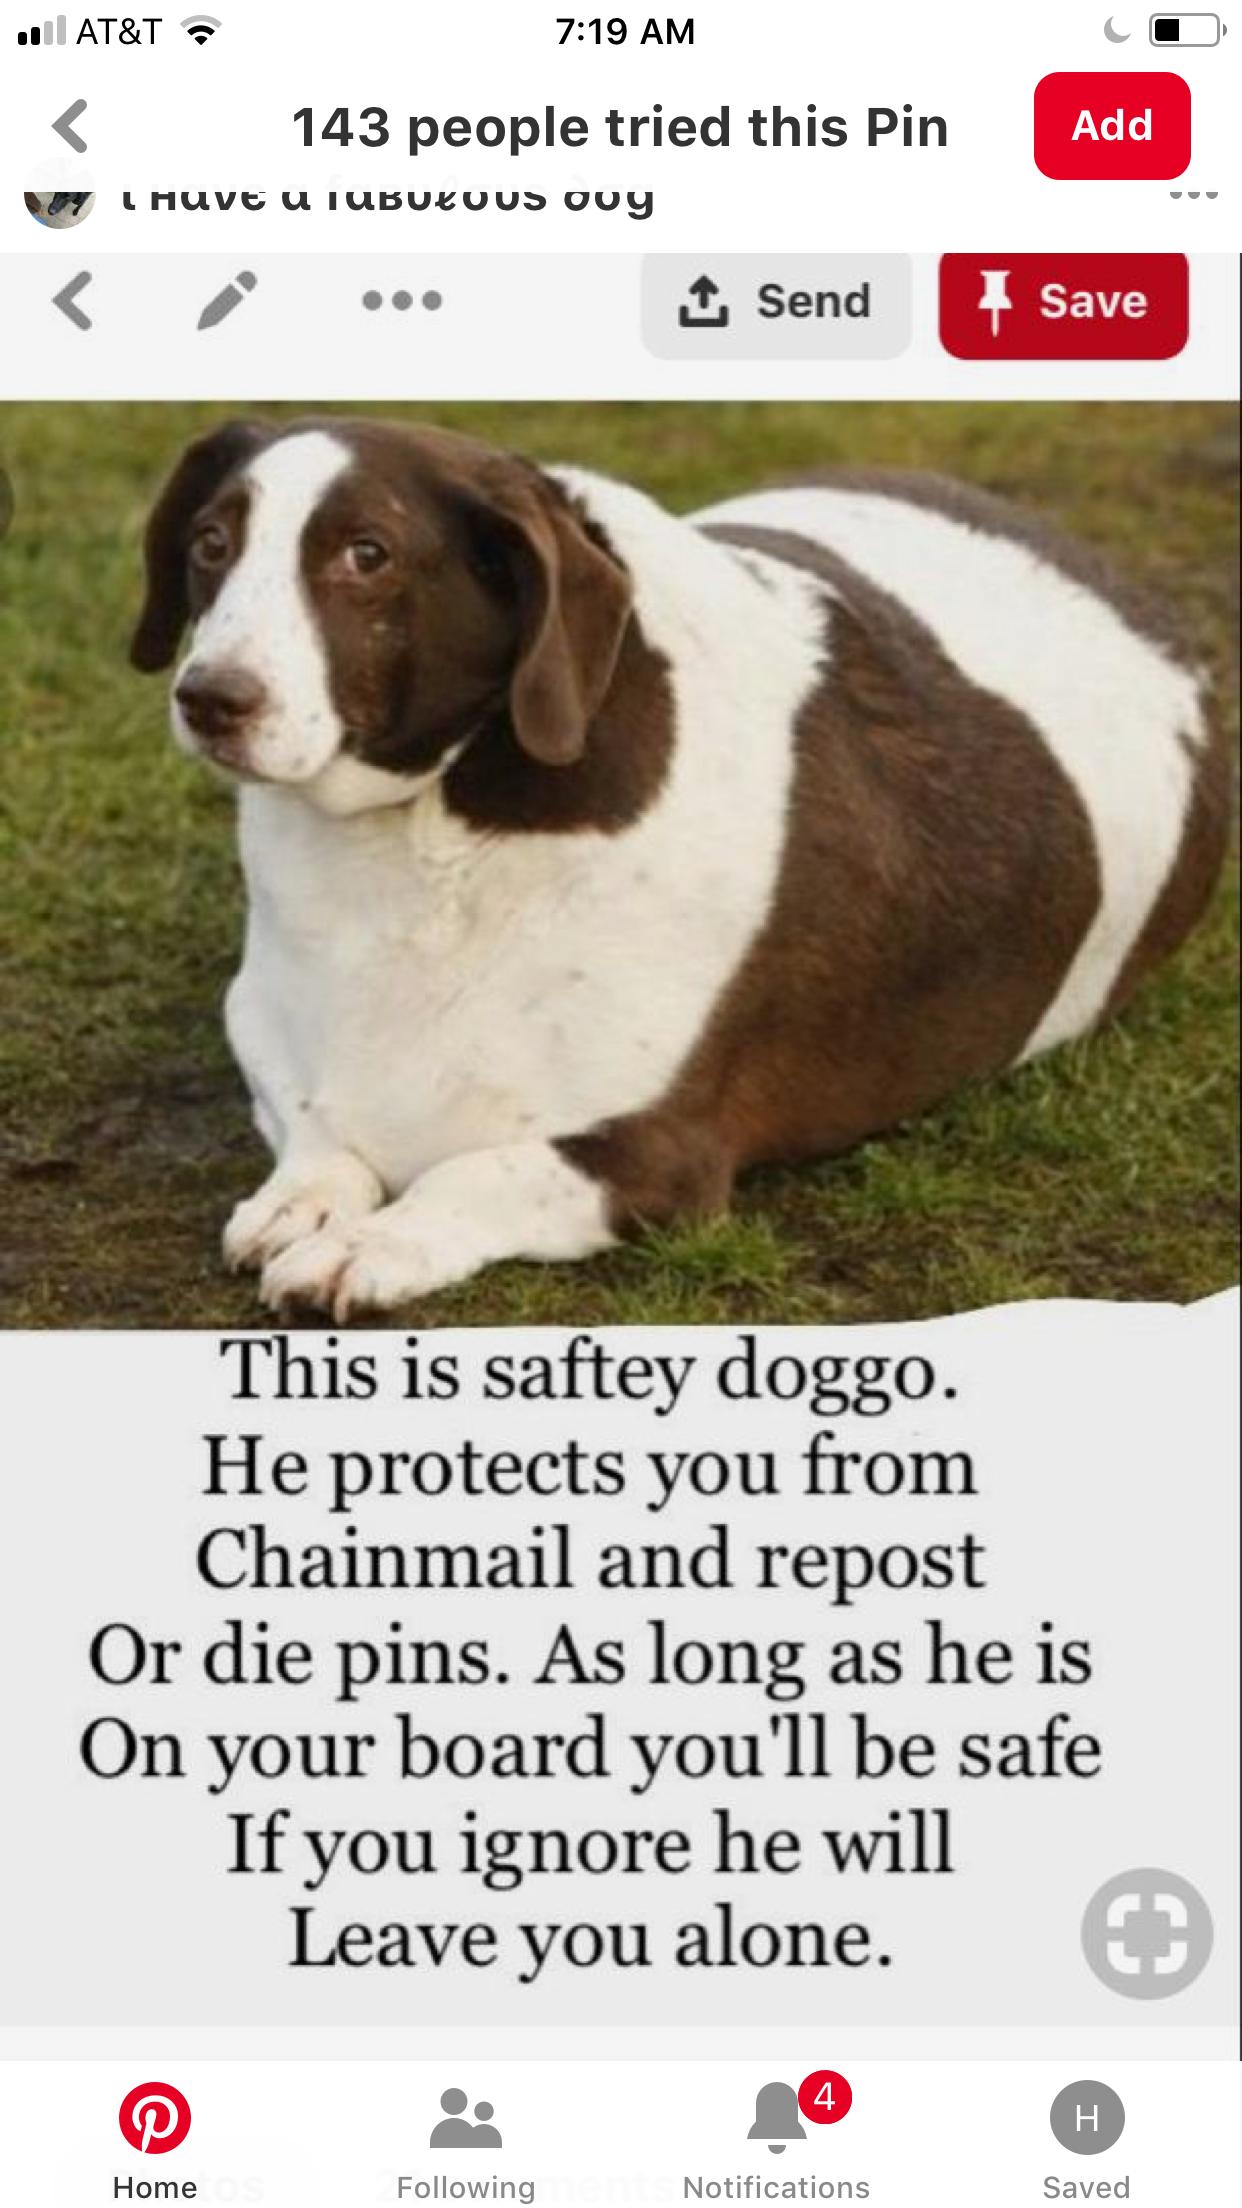 Pin by Hailey BoBailey on Awesomeness Doggo, Funny